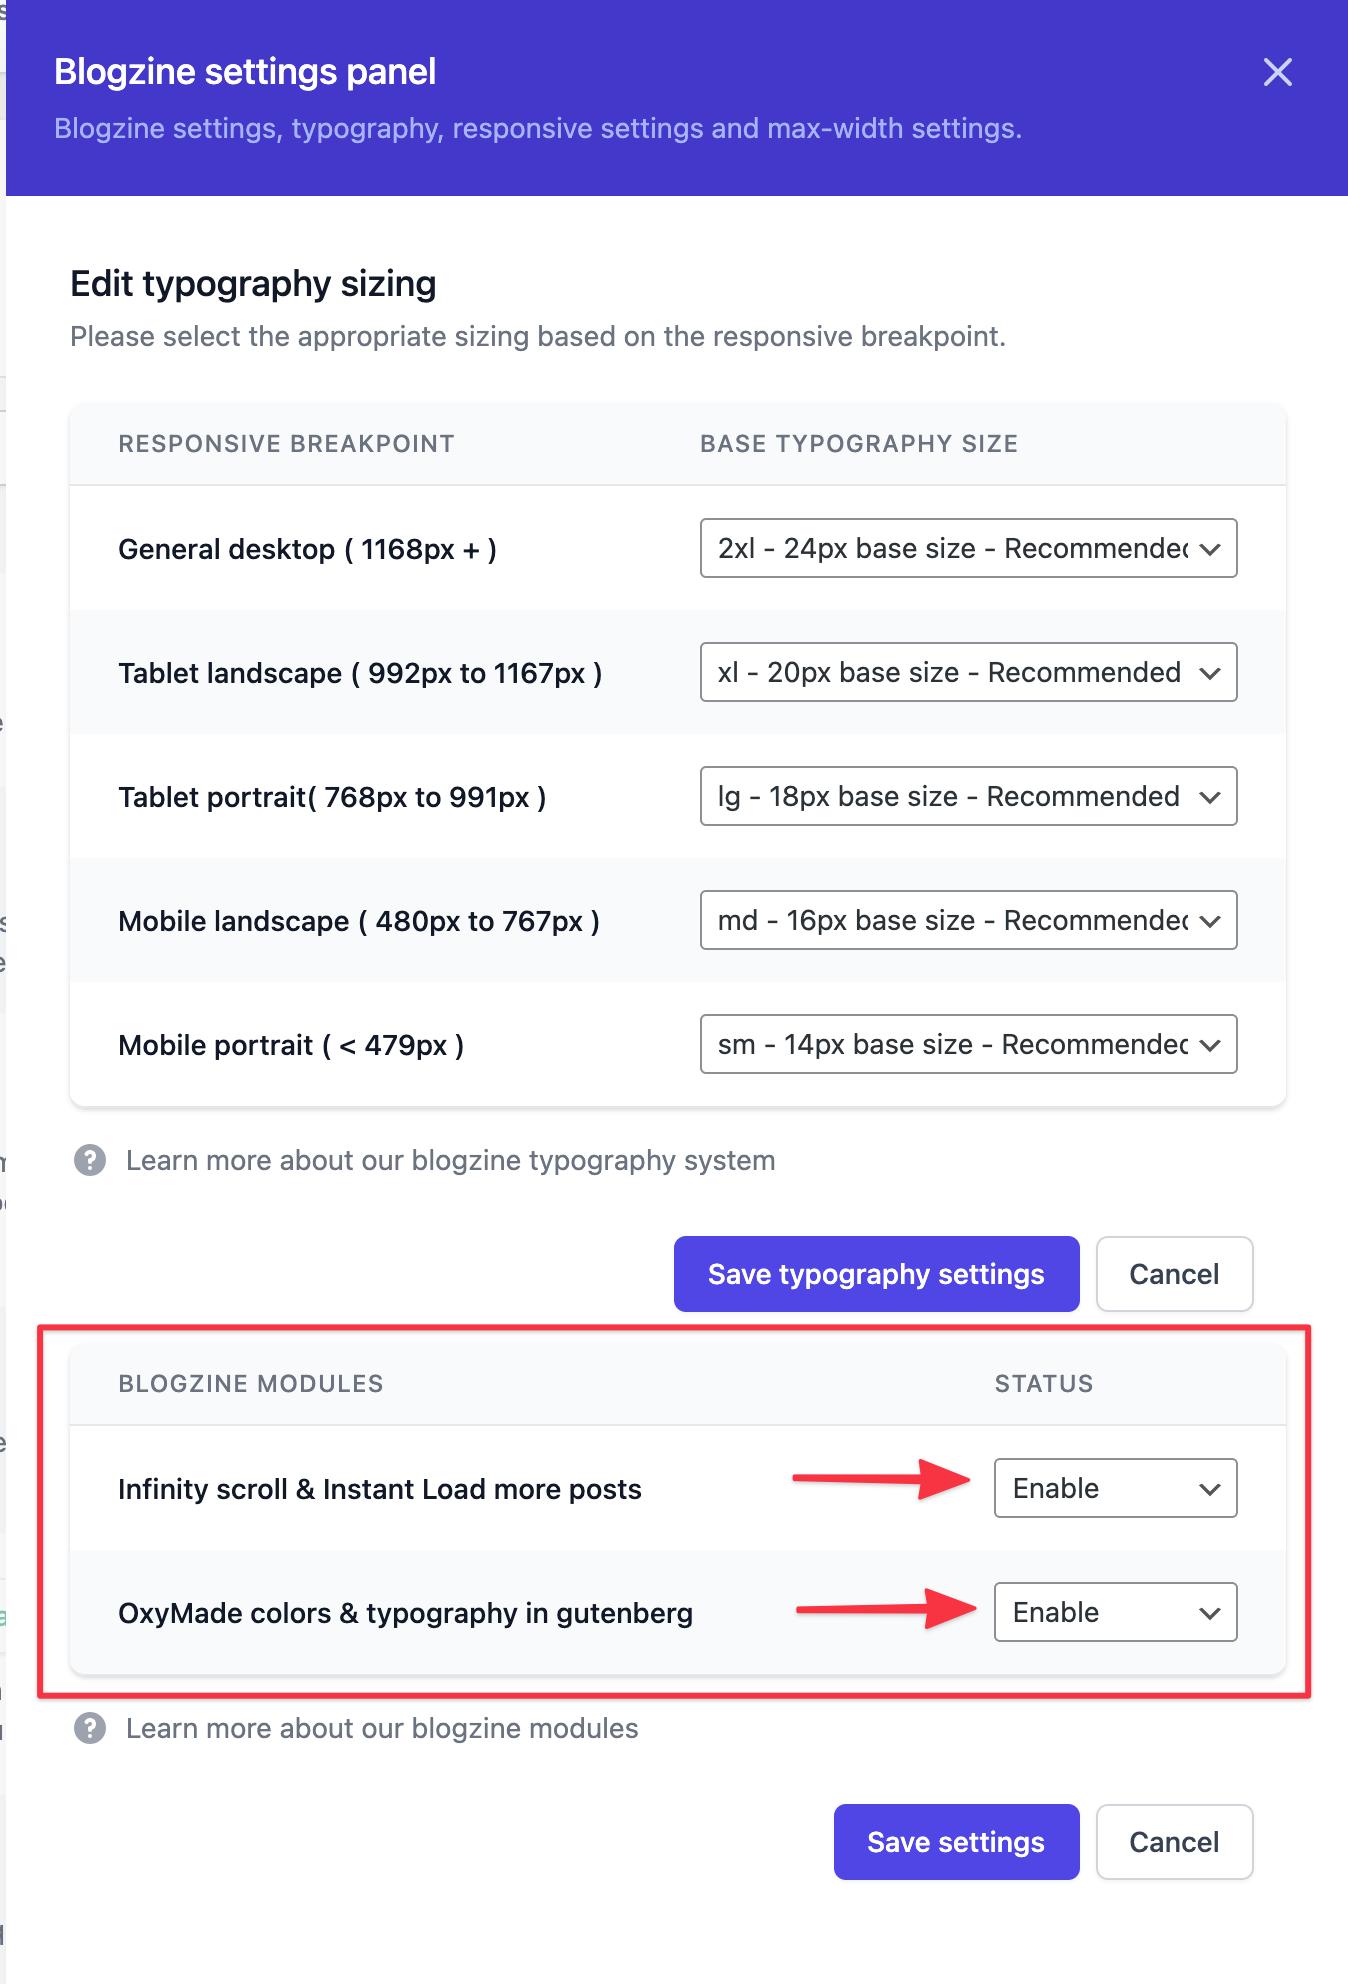 Blogzine settings panel